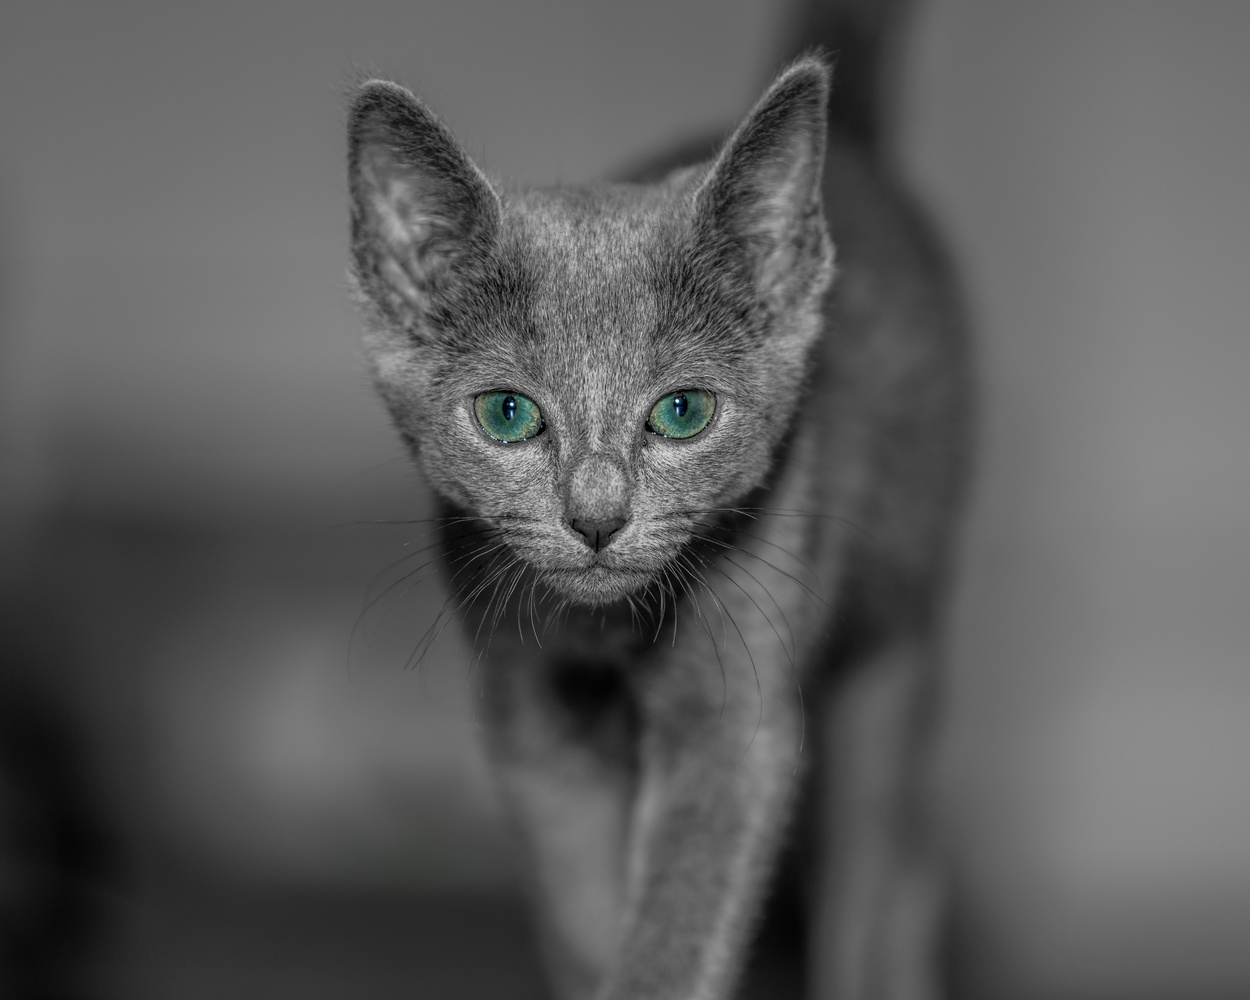 Cat by Skyler Ewing